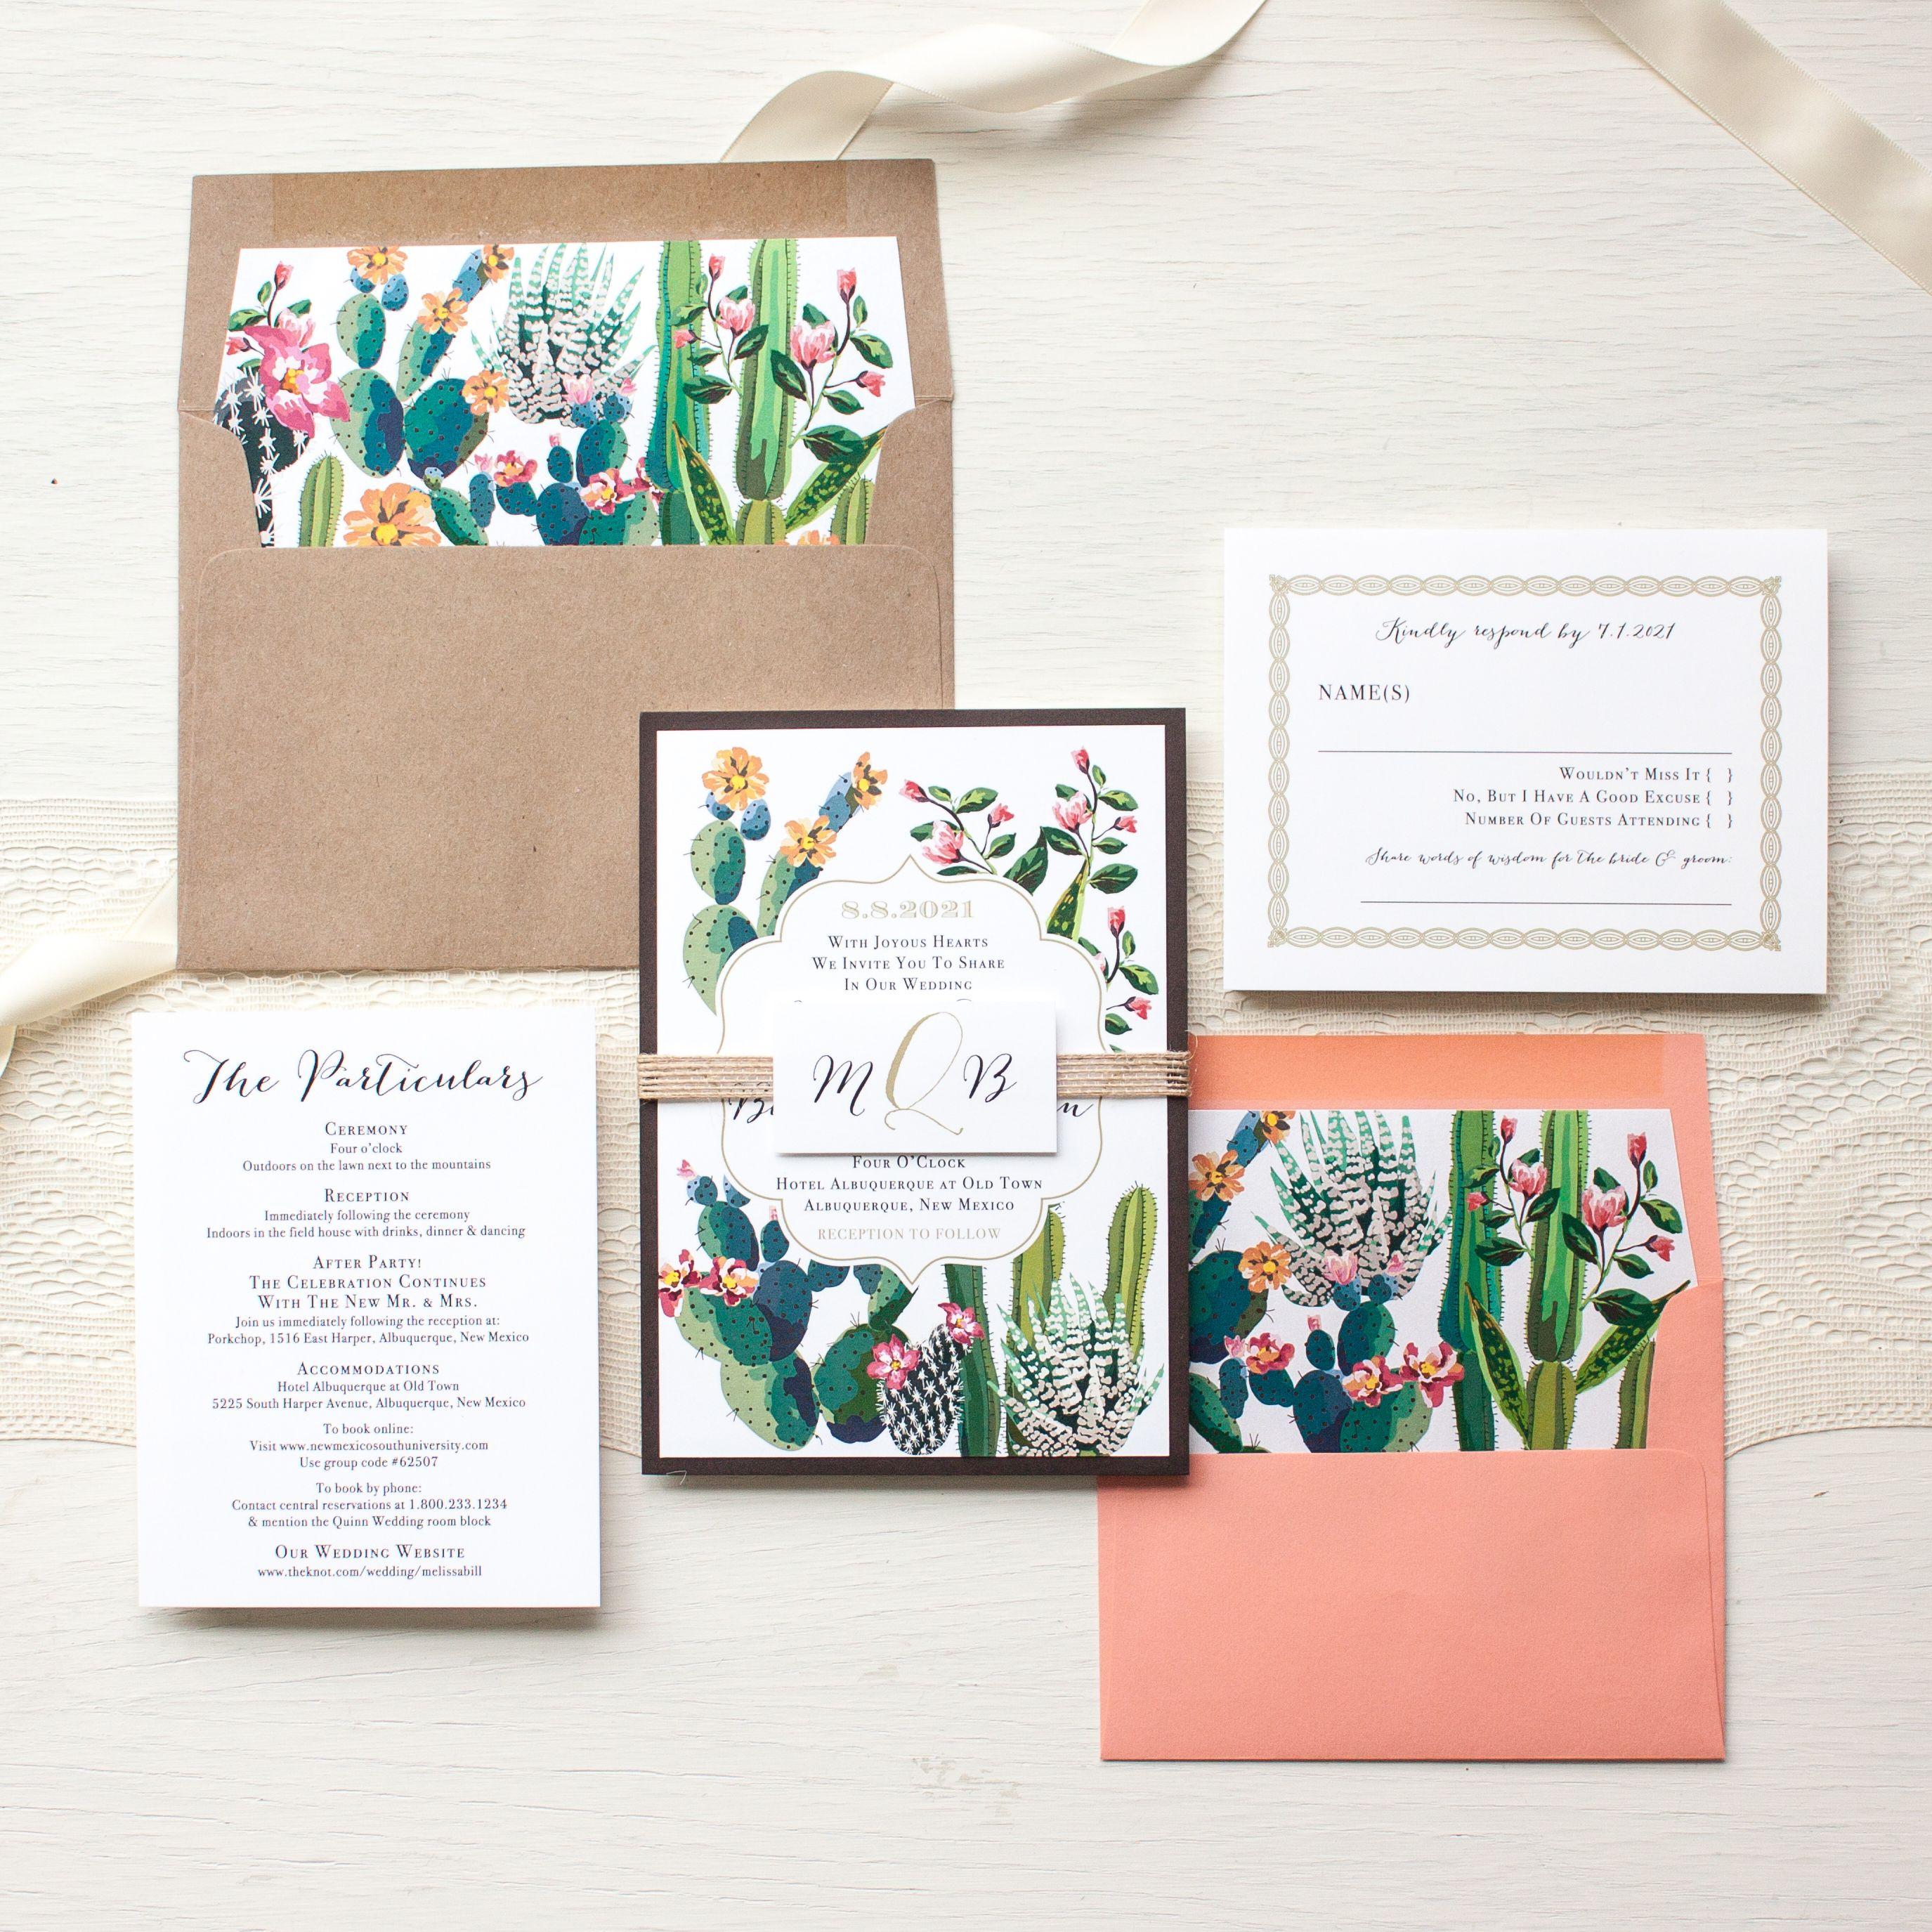 Desert Inspired Wedding Invites So Rustic And Chic Colorful Cactus Graphics Bright C